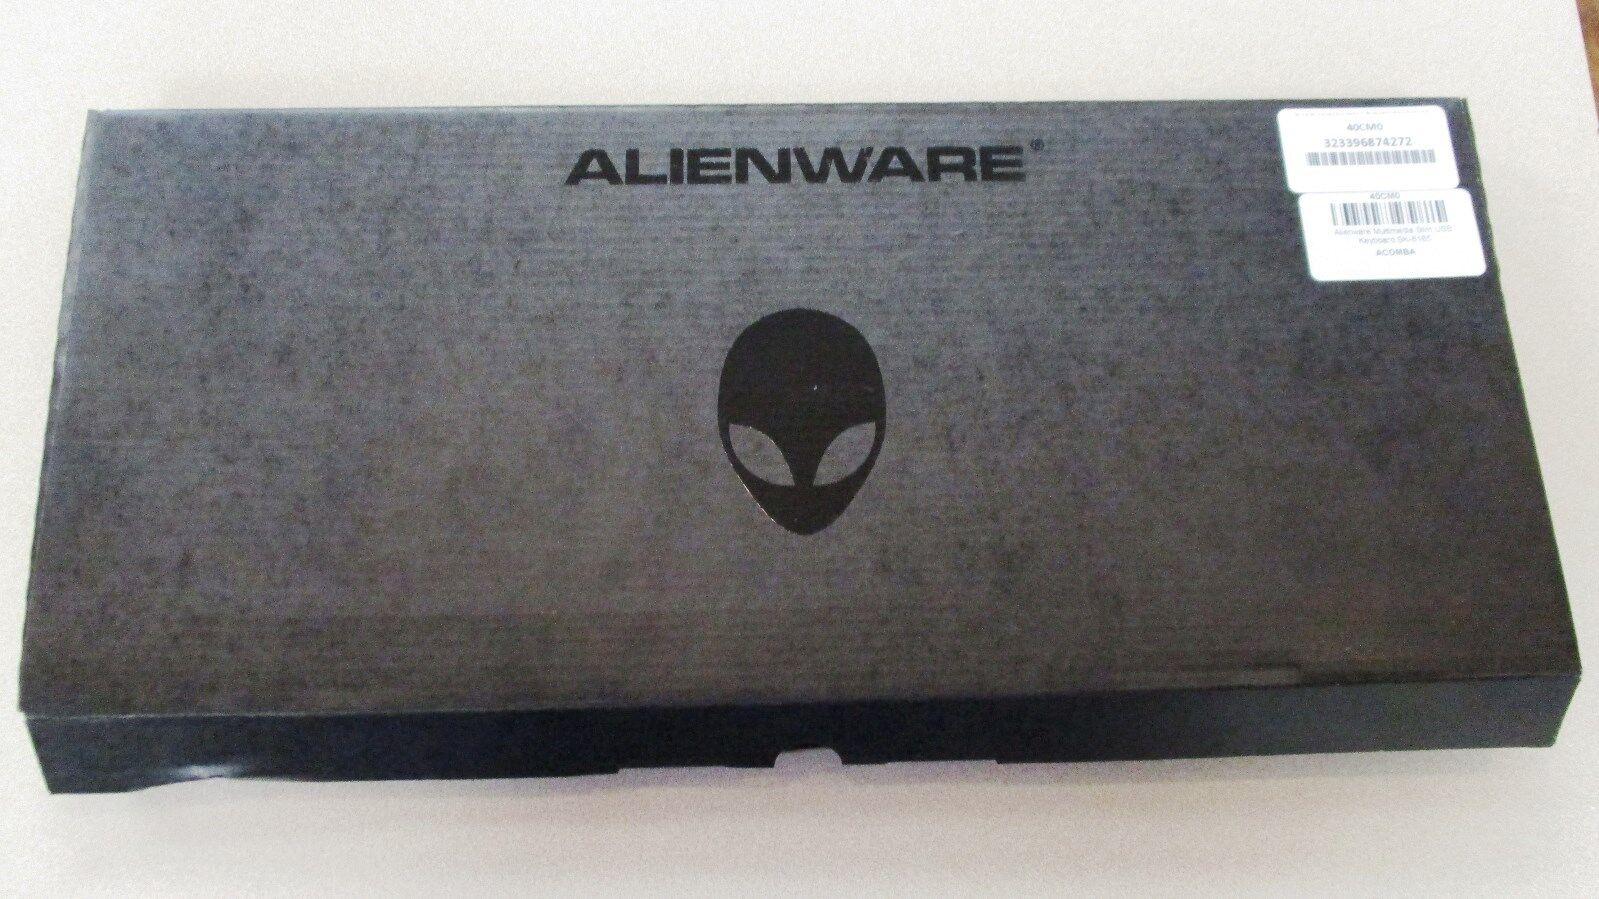 NEW Dell AlienWARE Multimedia Black USB Keyboard SK-8165 H9Y